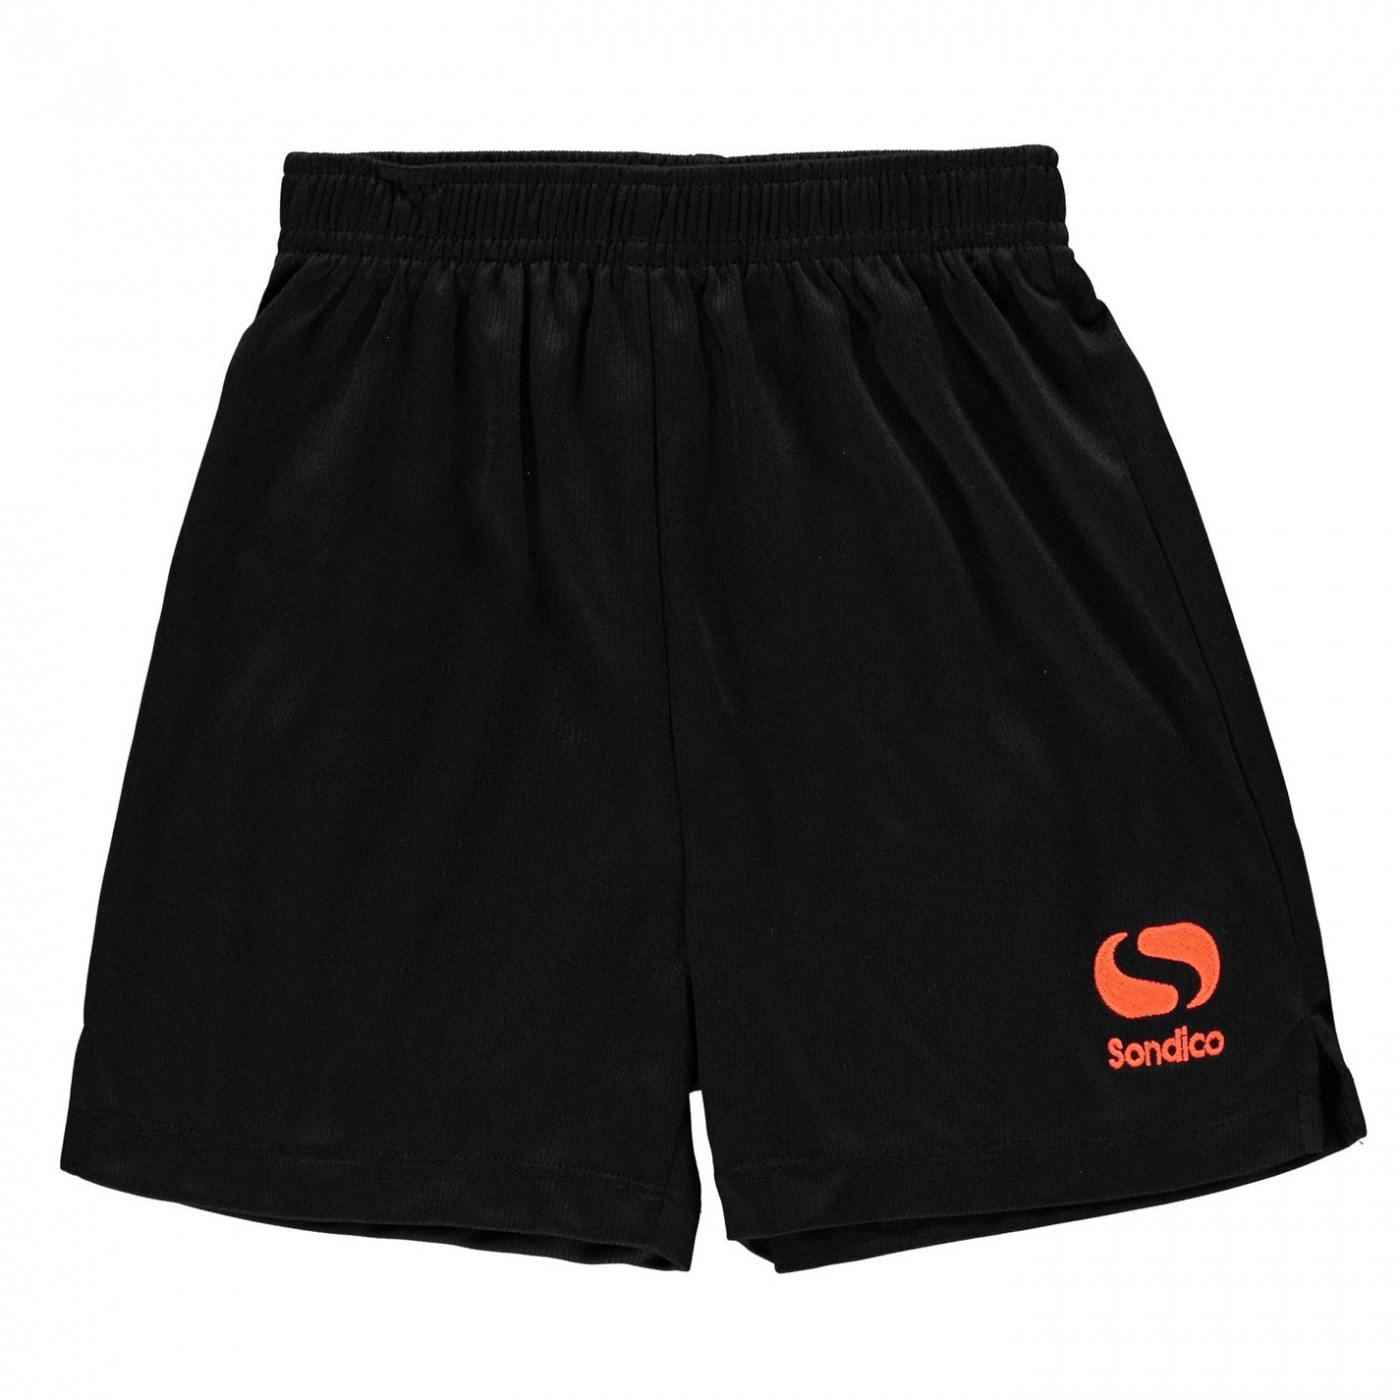 Sondico Core Football Shorts Junior